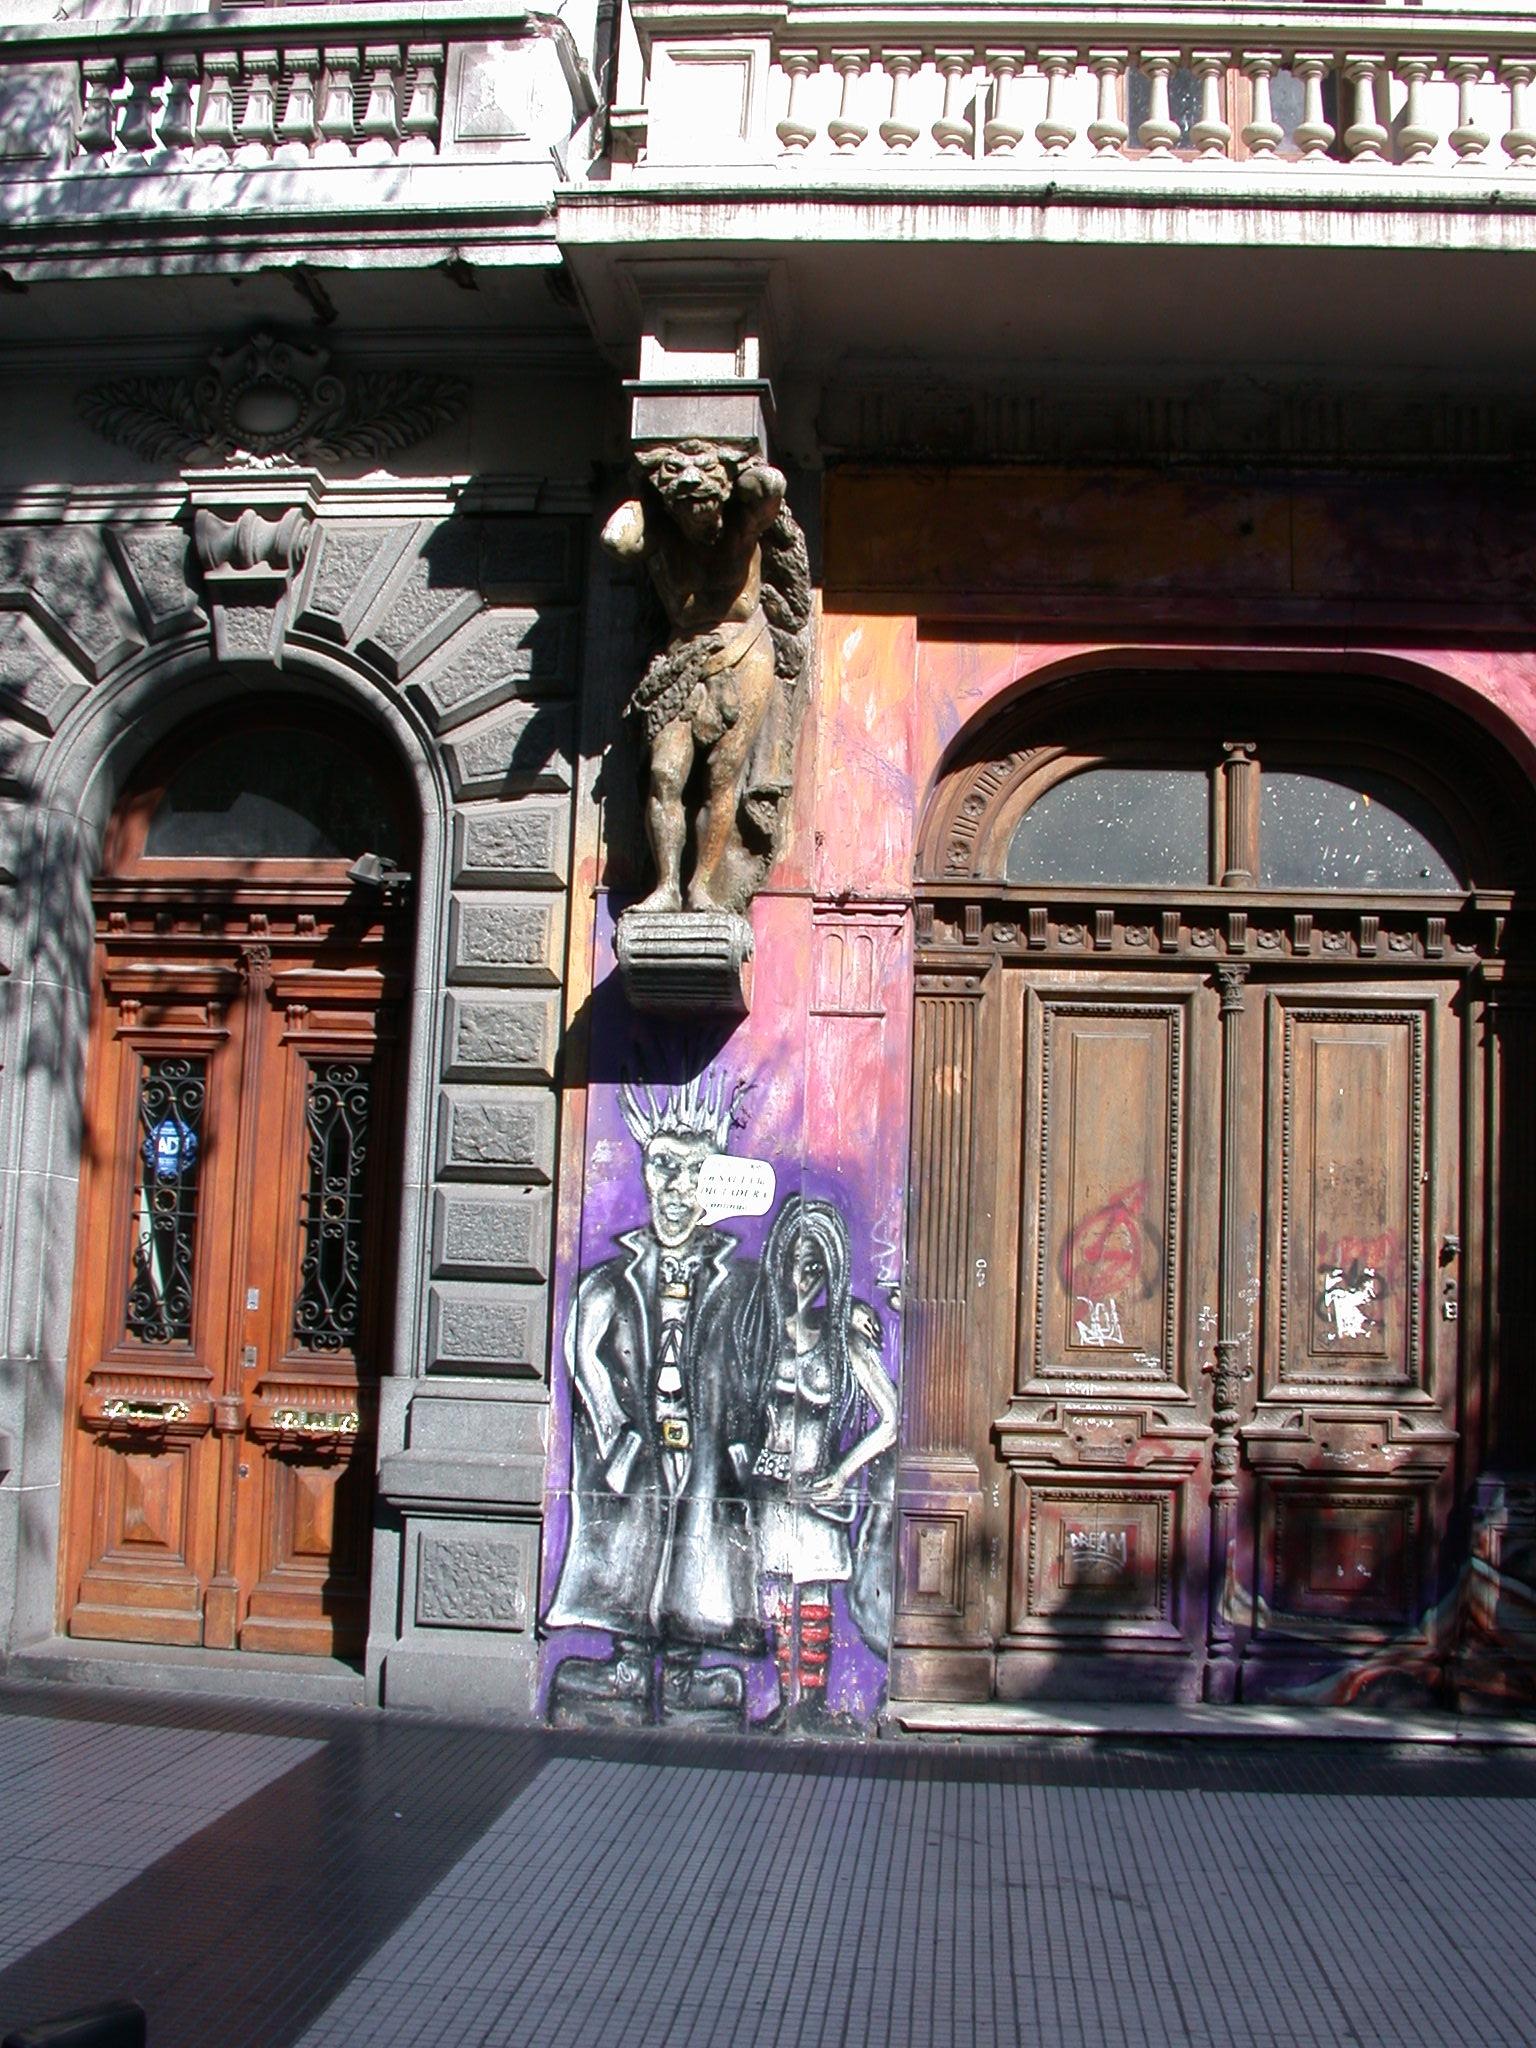 Street Graffiti, Buenos Aires, Argentina